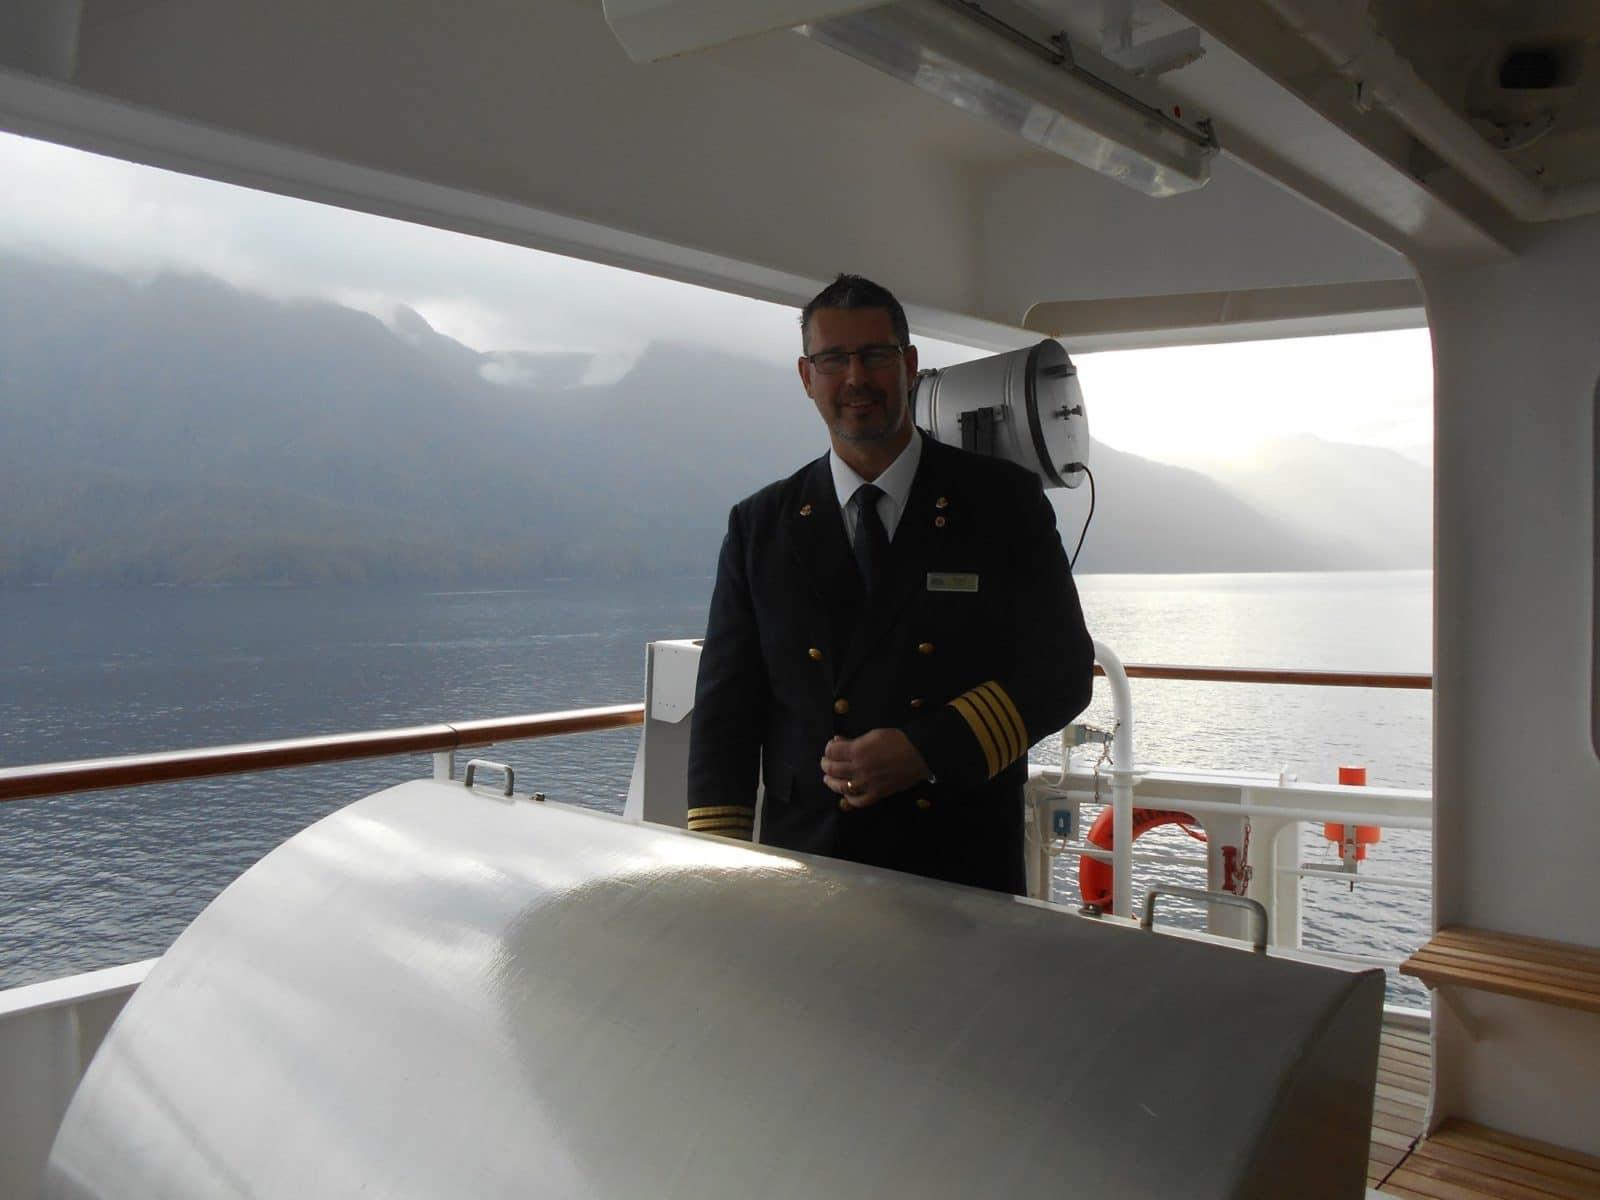 Captain of RSSC Mariner